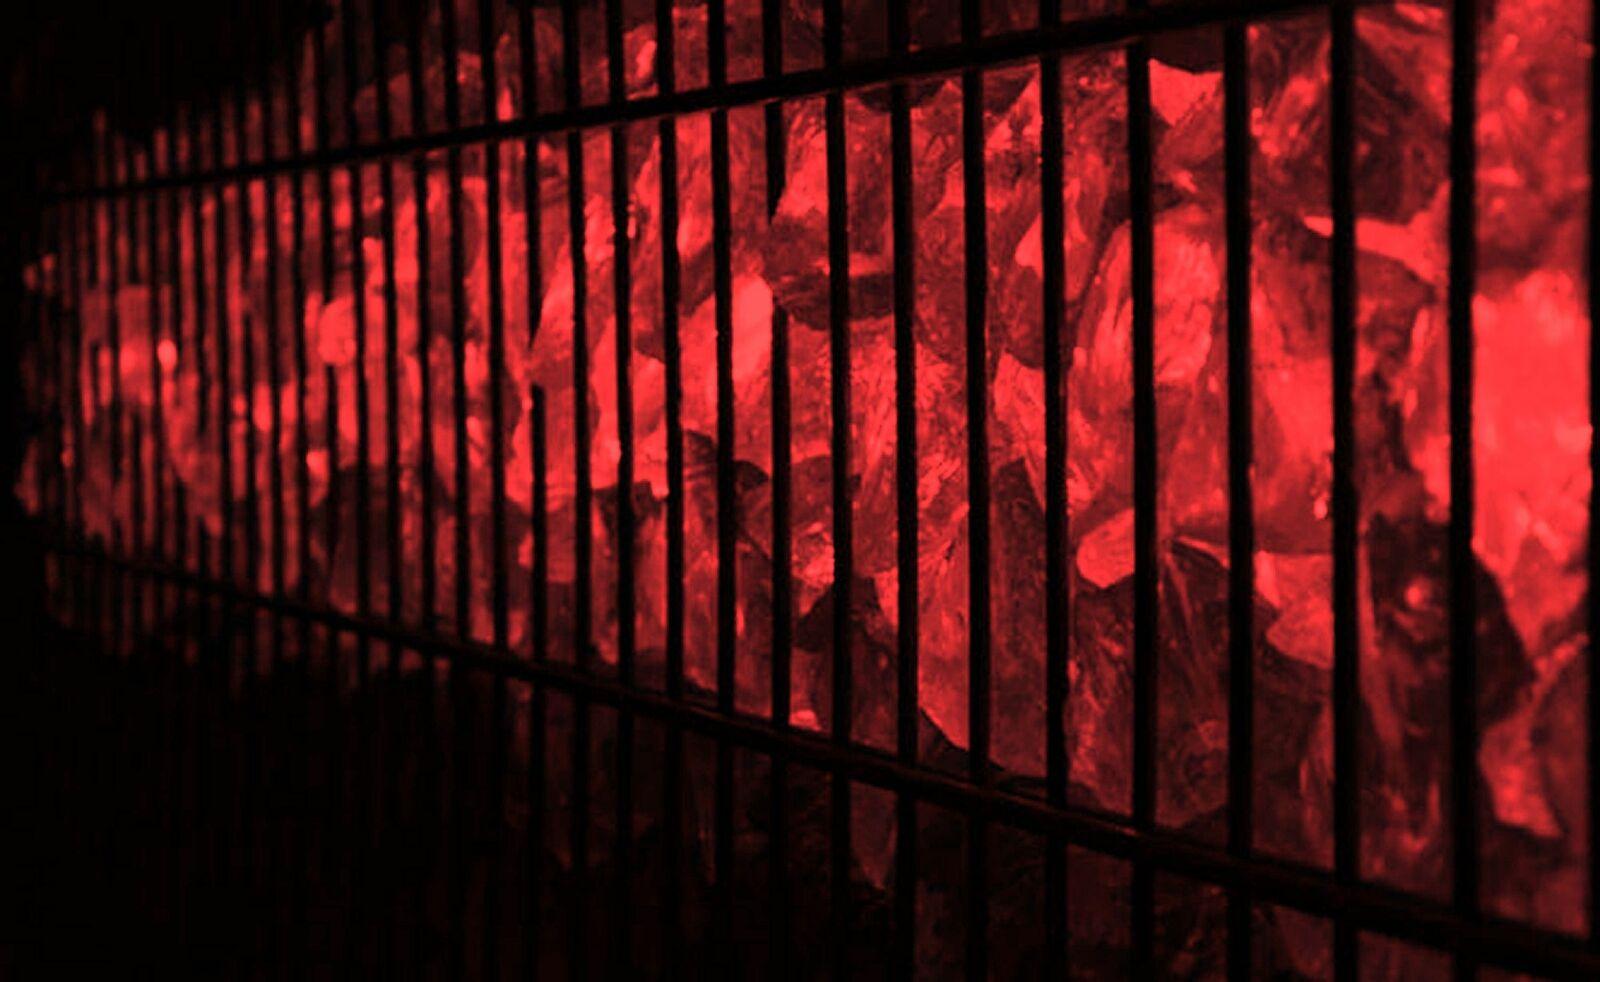 Led Gabionen Licht Beleuchtung LED 2x0,60m länge 360° Farbe rot Garten 230 Volt